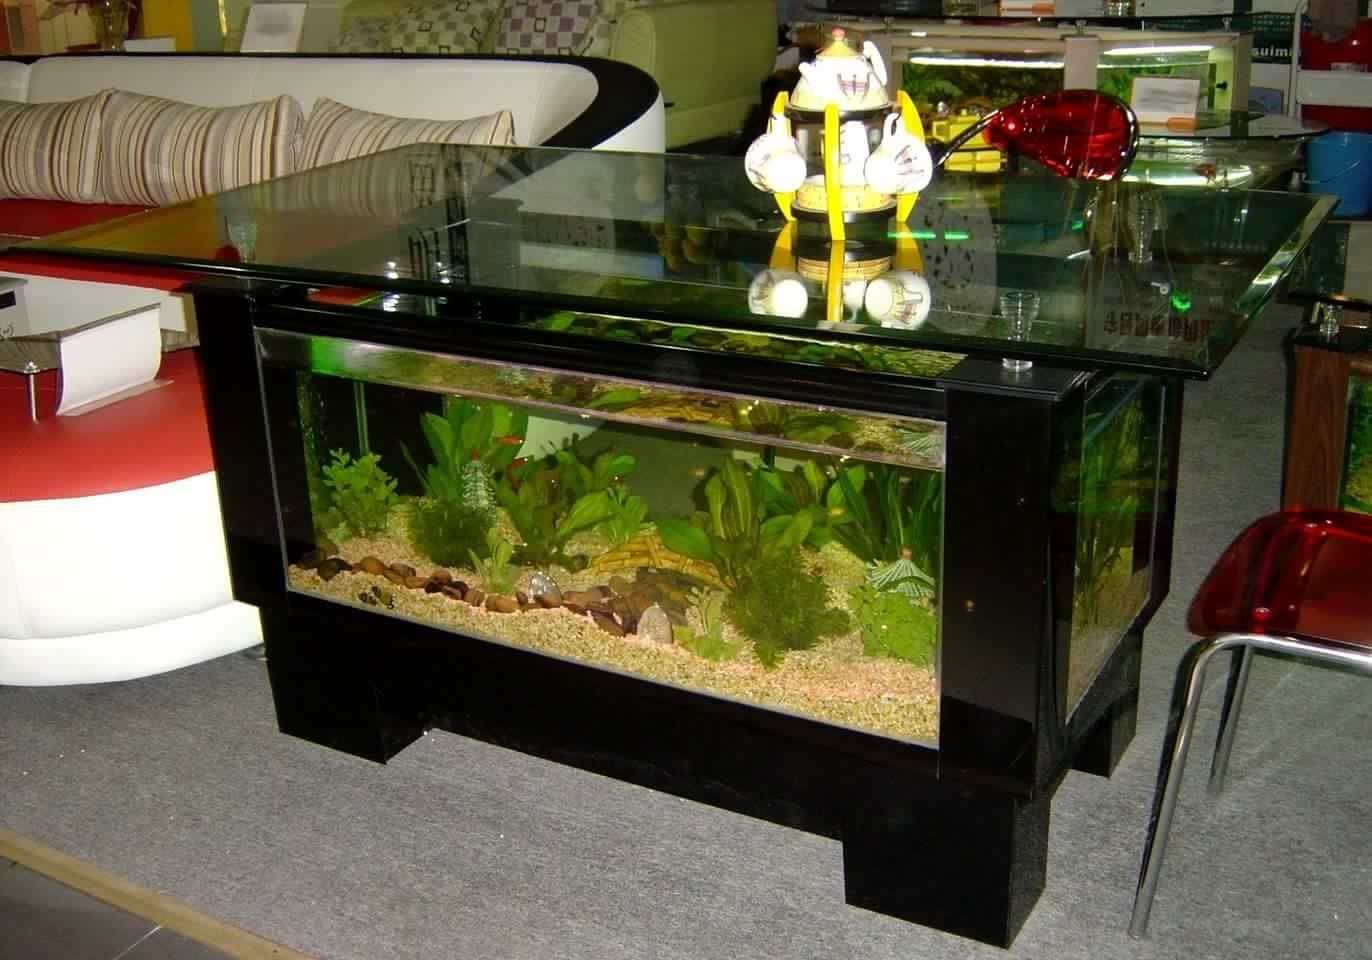 Fish aquarium in chandigarh - Explore Fish Tank Decor Fish Tank Table And More